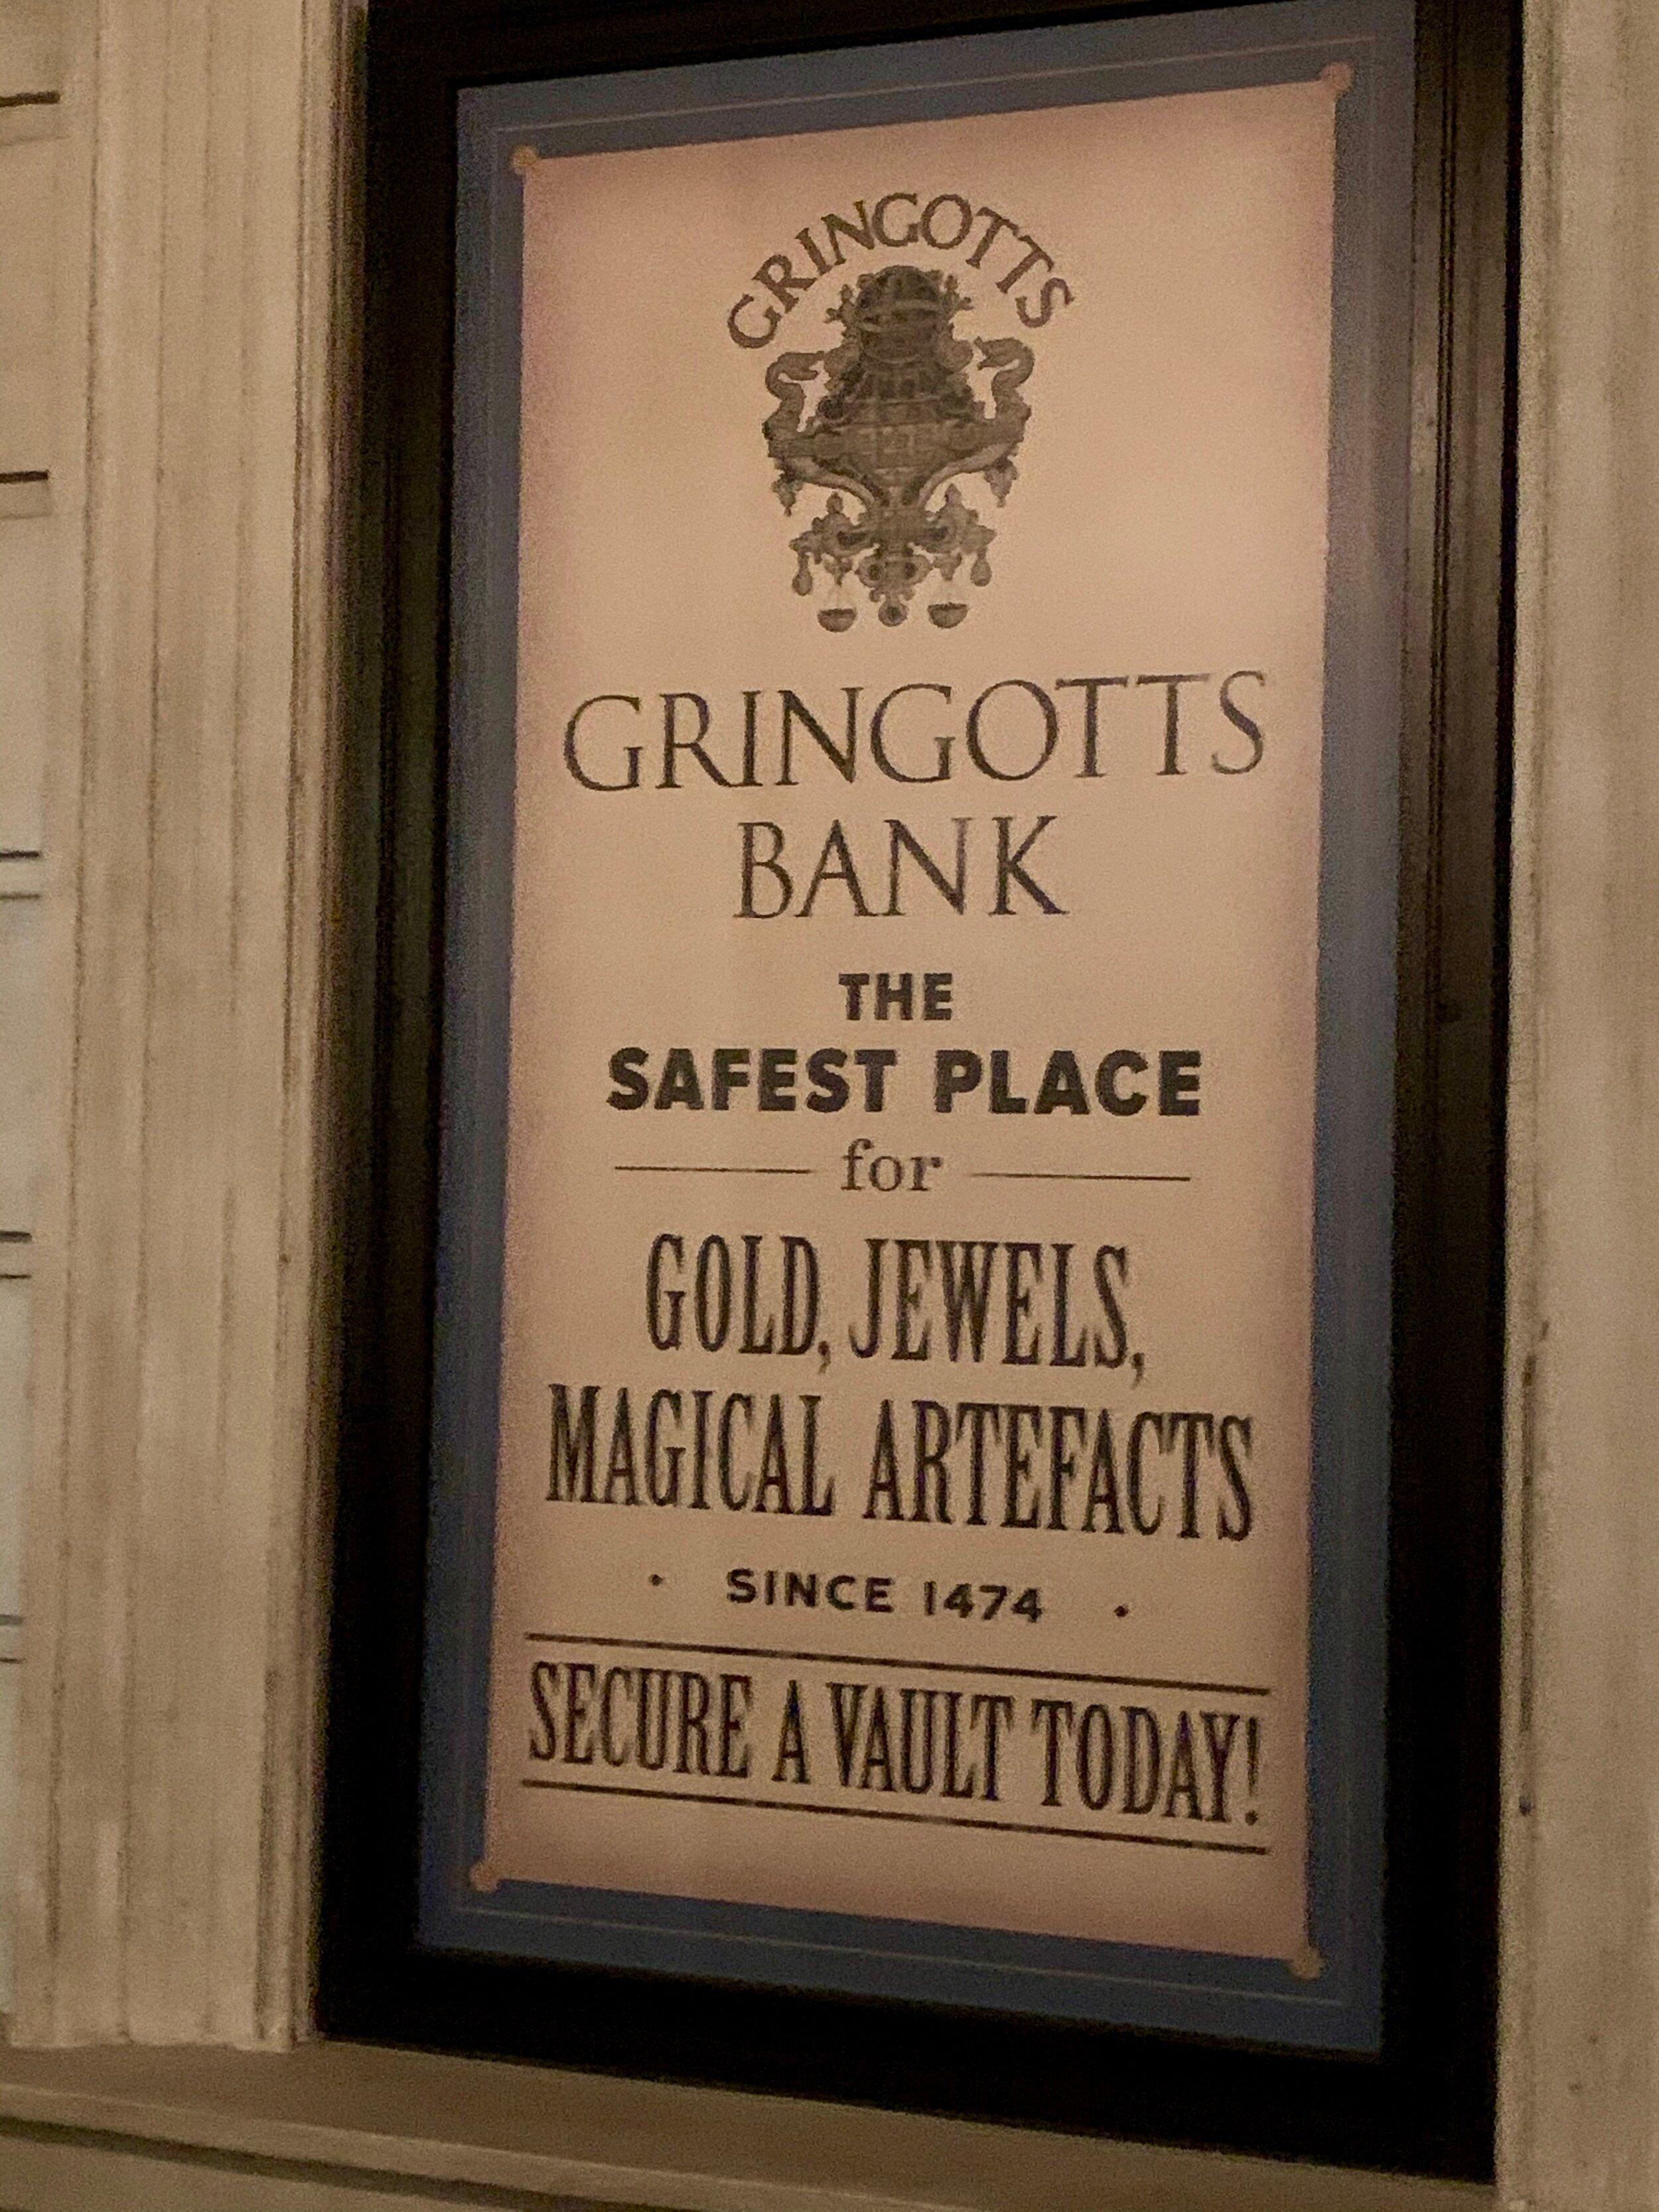 Gringott's advertisement